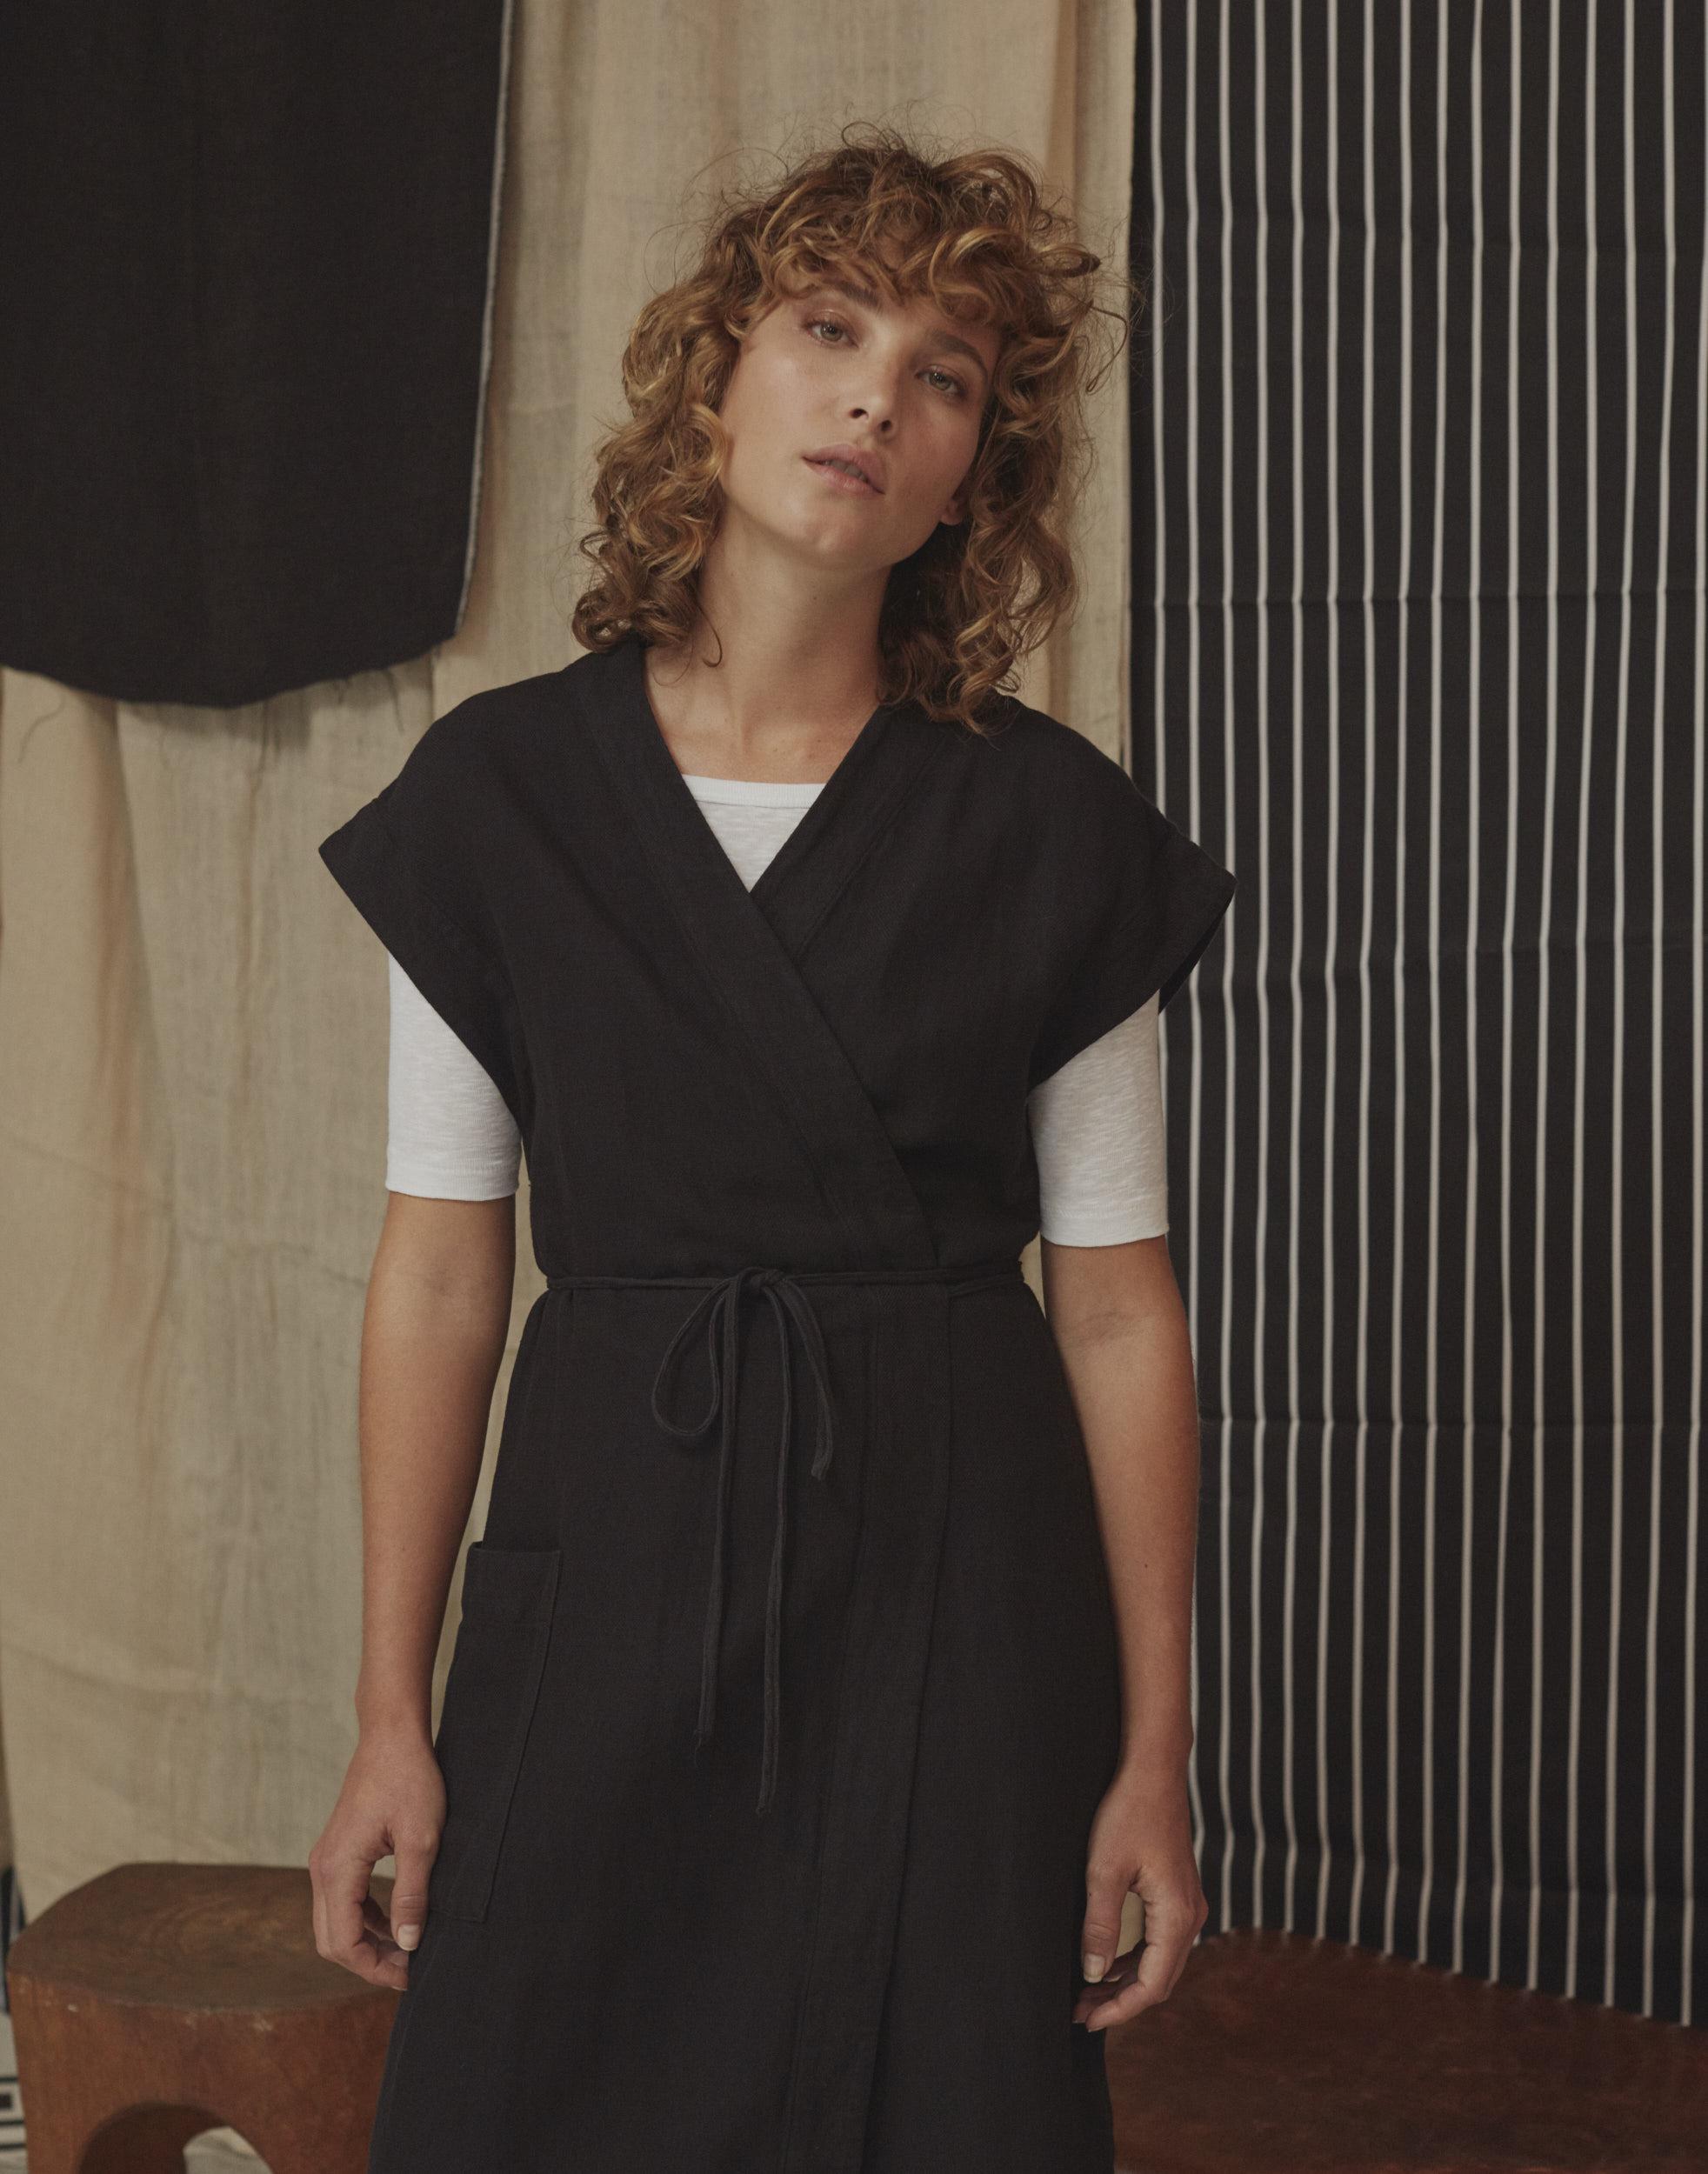 ymc-ss17-collection-okoro-women-fashion-folkr-2